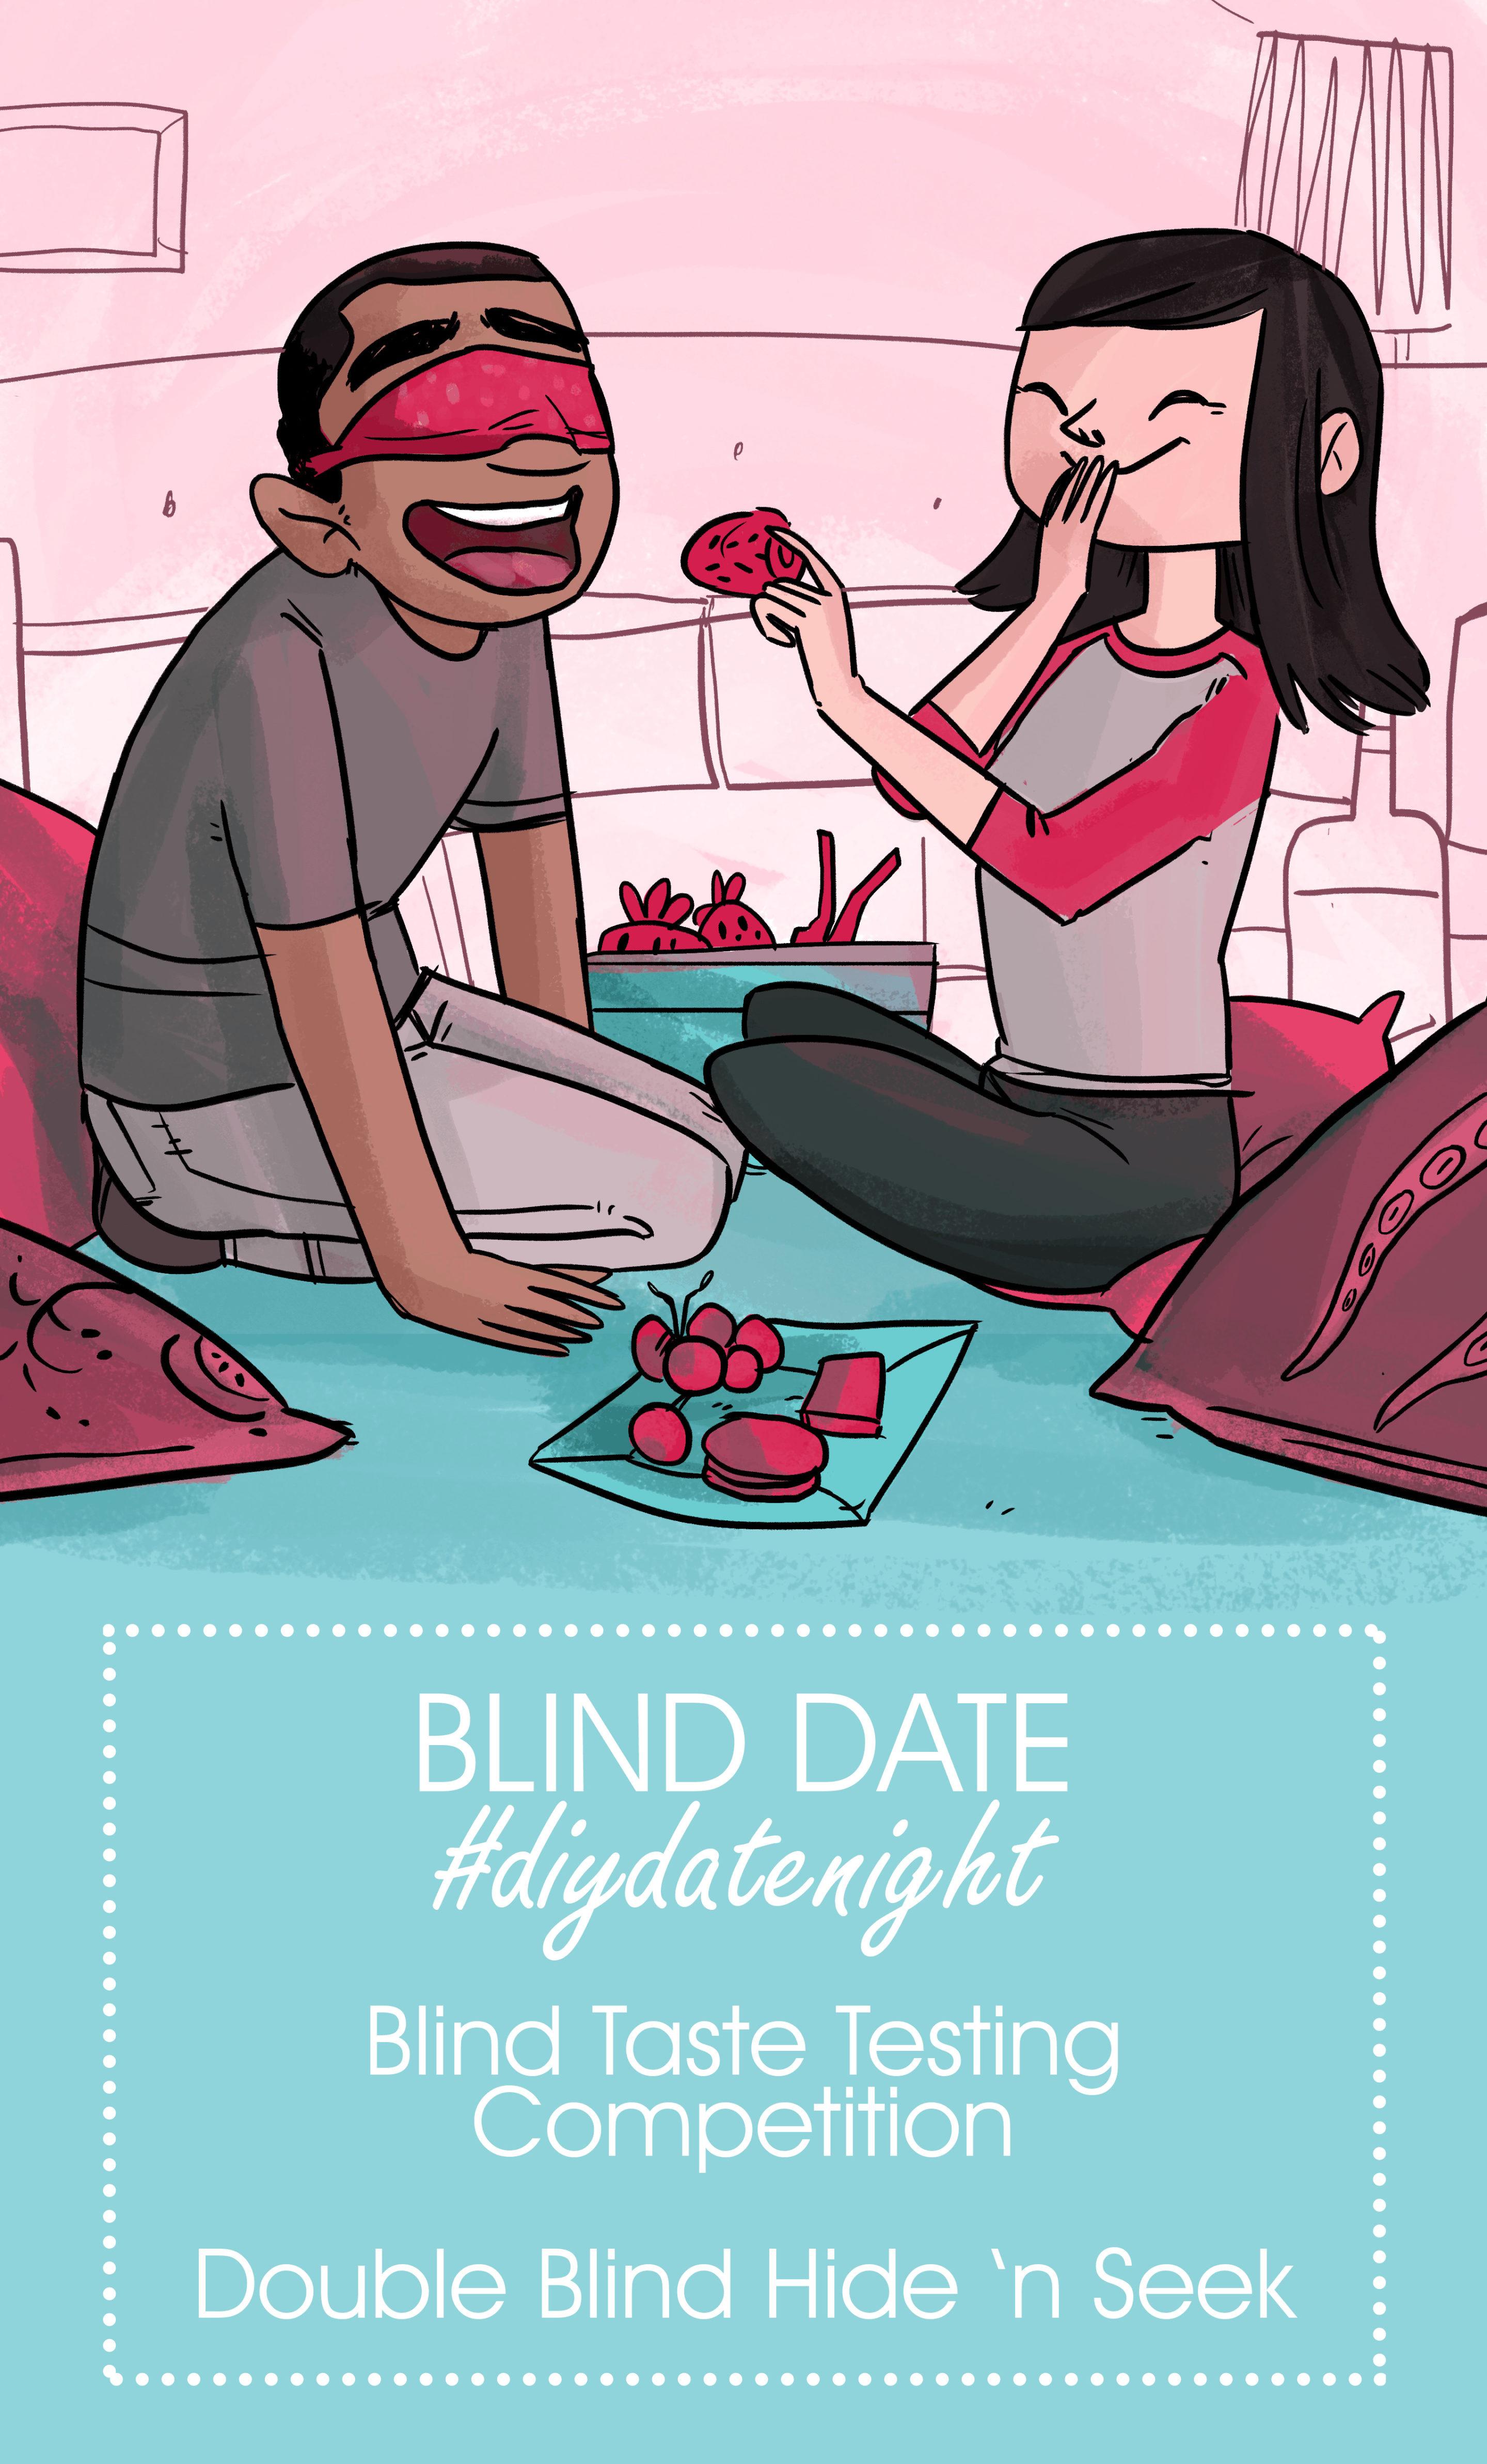 Illustration with Text - Blind Date #diydatenight